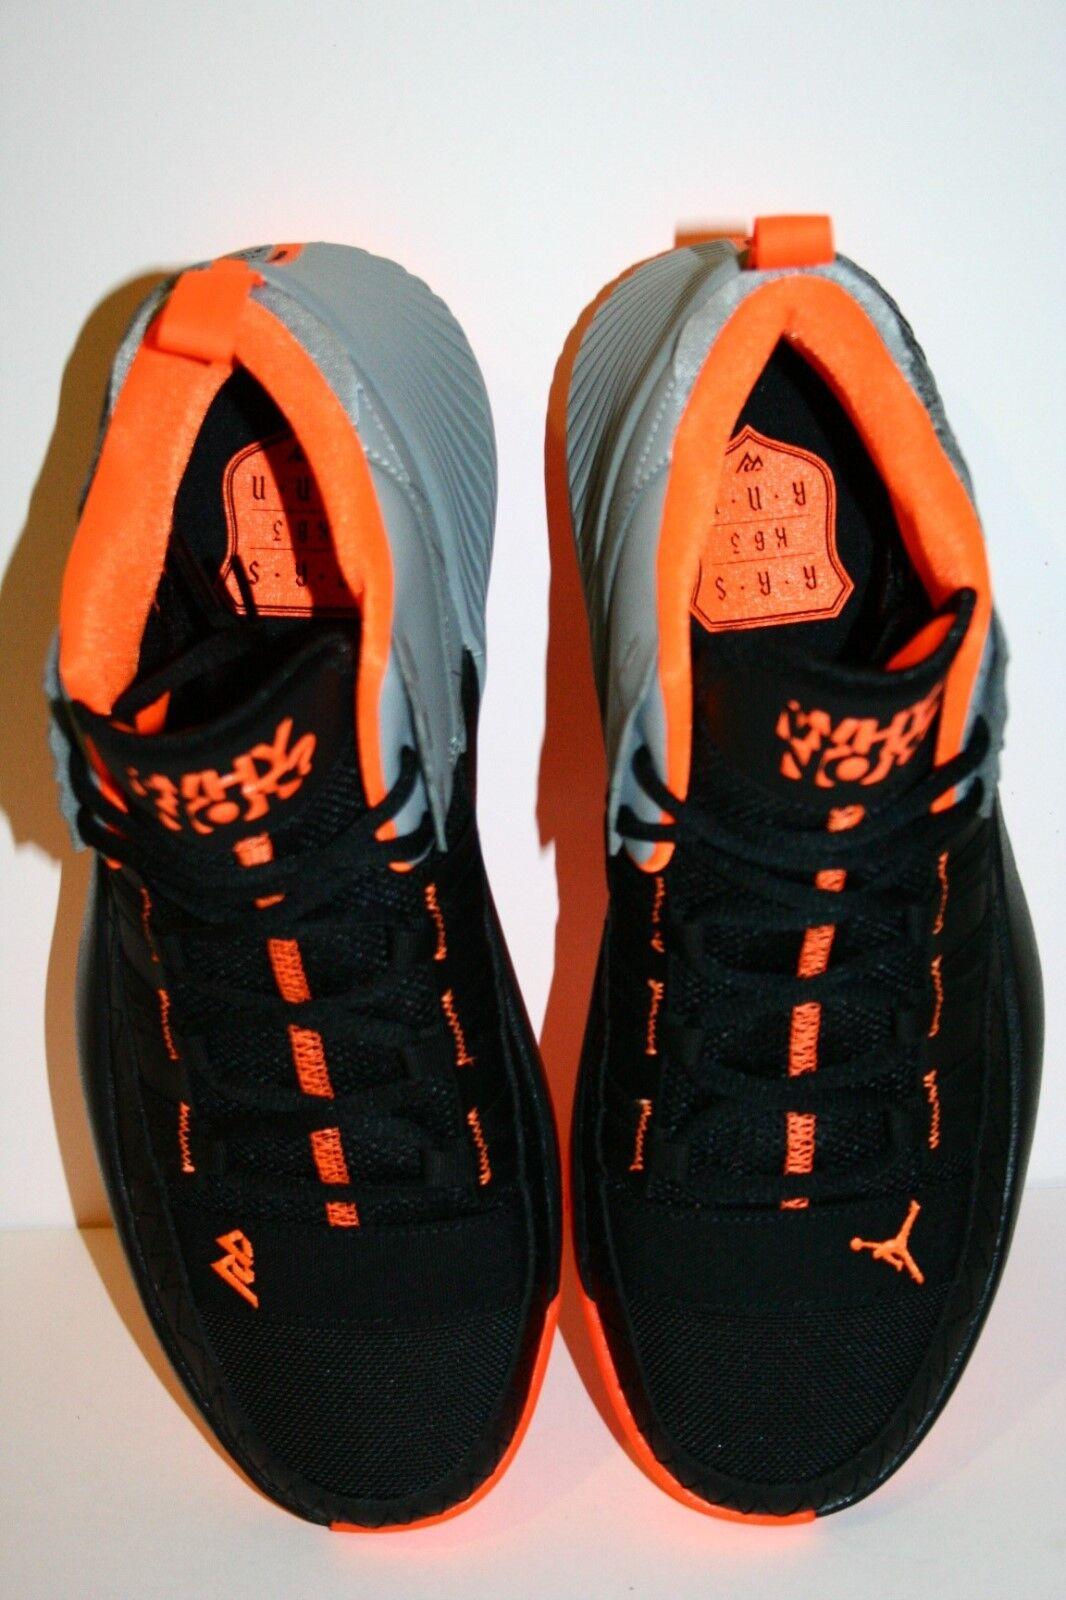 Originale Nike Air Jordan Why Why Why Not Zer0.1 Caos Nere Arancio Bv5498 008 Uomo 23b69a